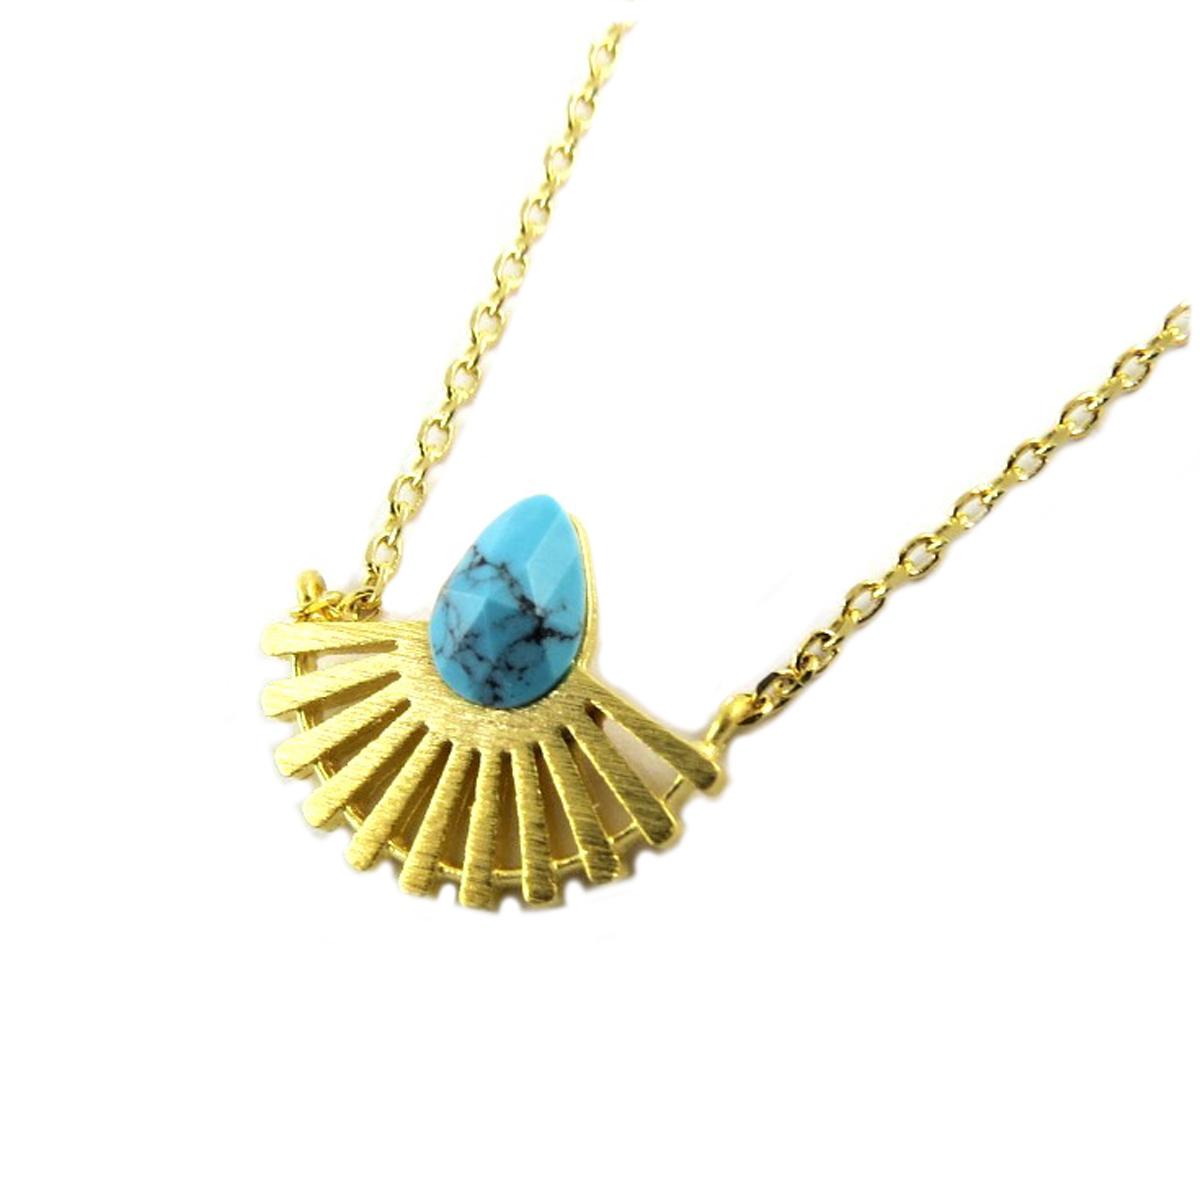 Collier artisanal \'Boho\' (plumes) turquoise doré - 15x7 mm - [Q1509]